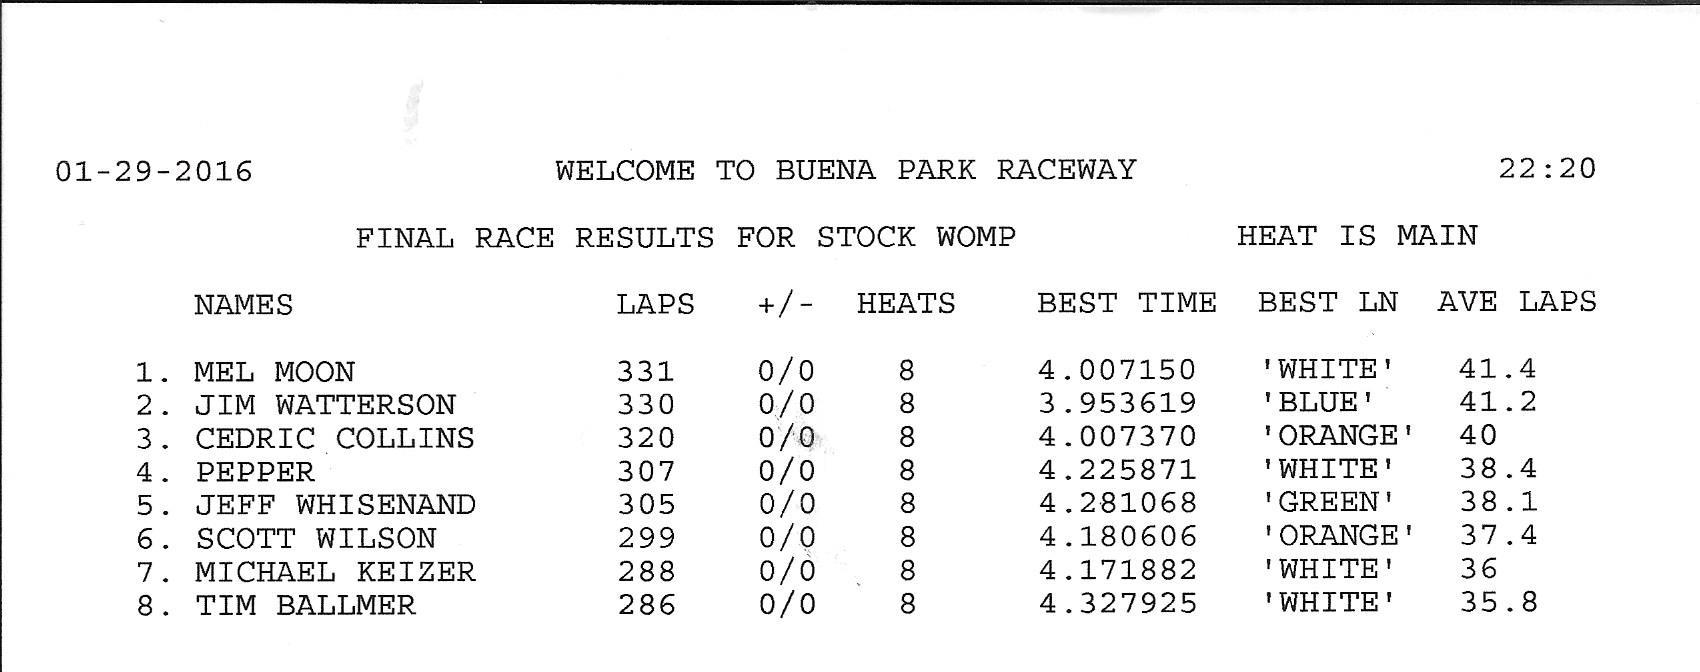 12916 womp results.jpg